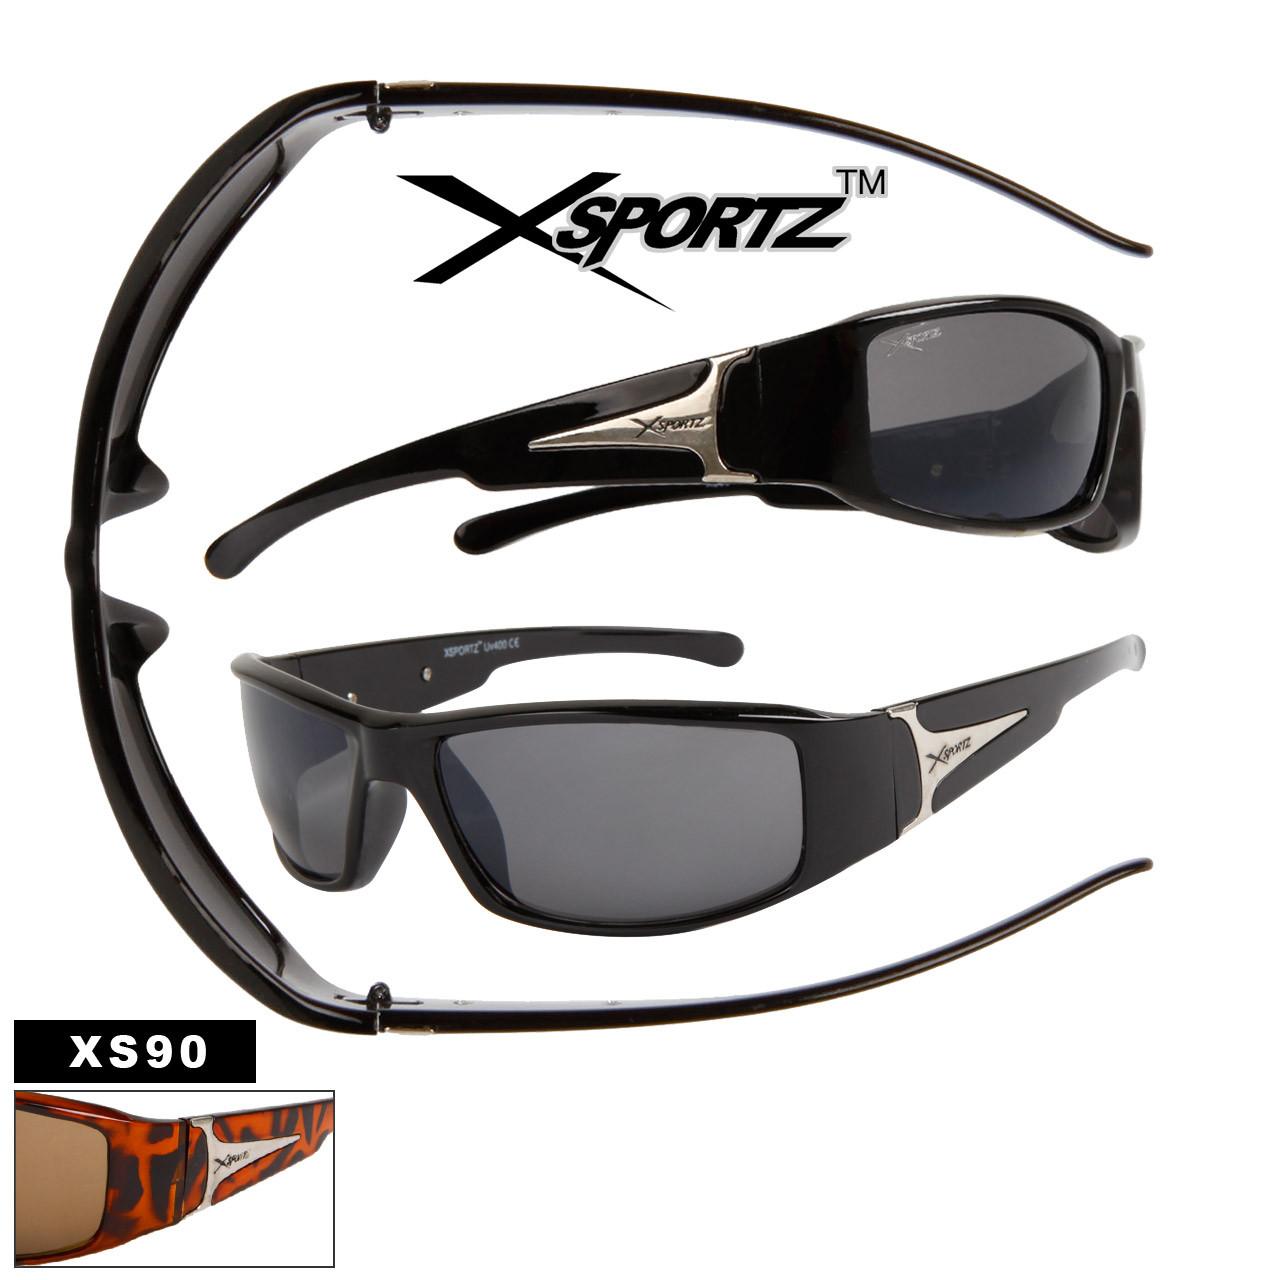 Xsportz XS90 Wholesale Sunglasses